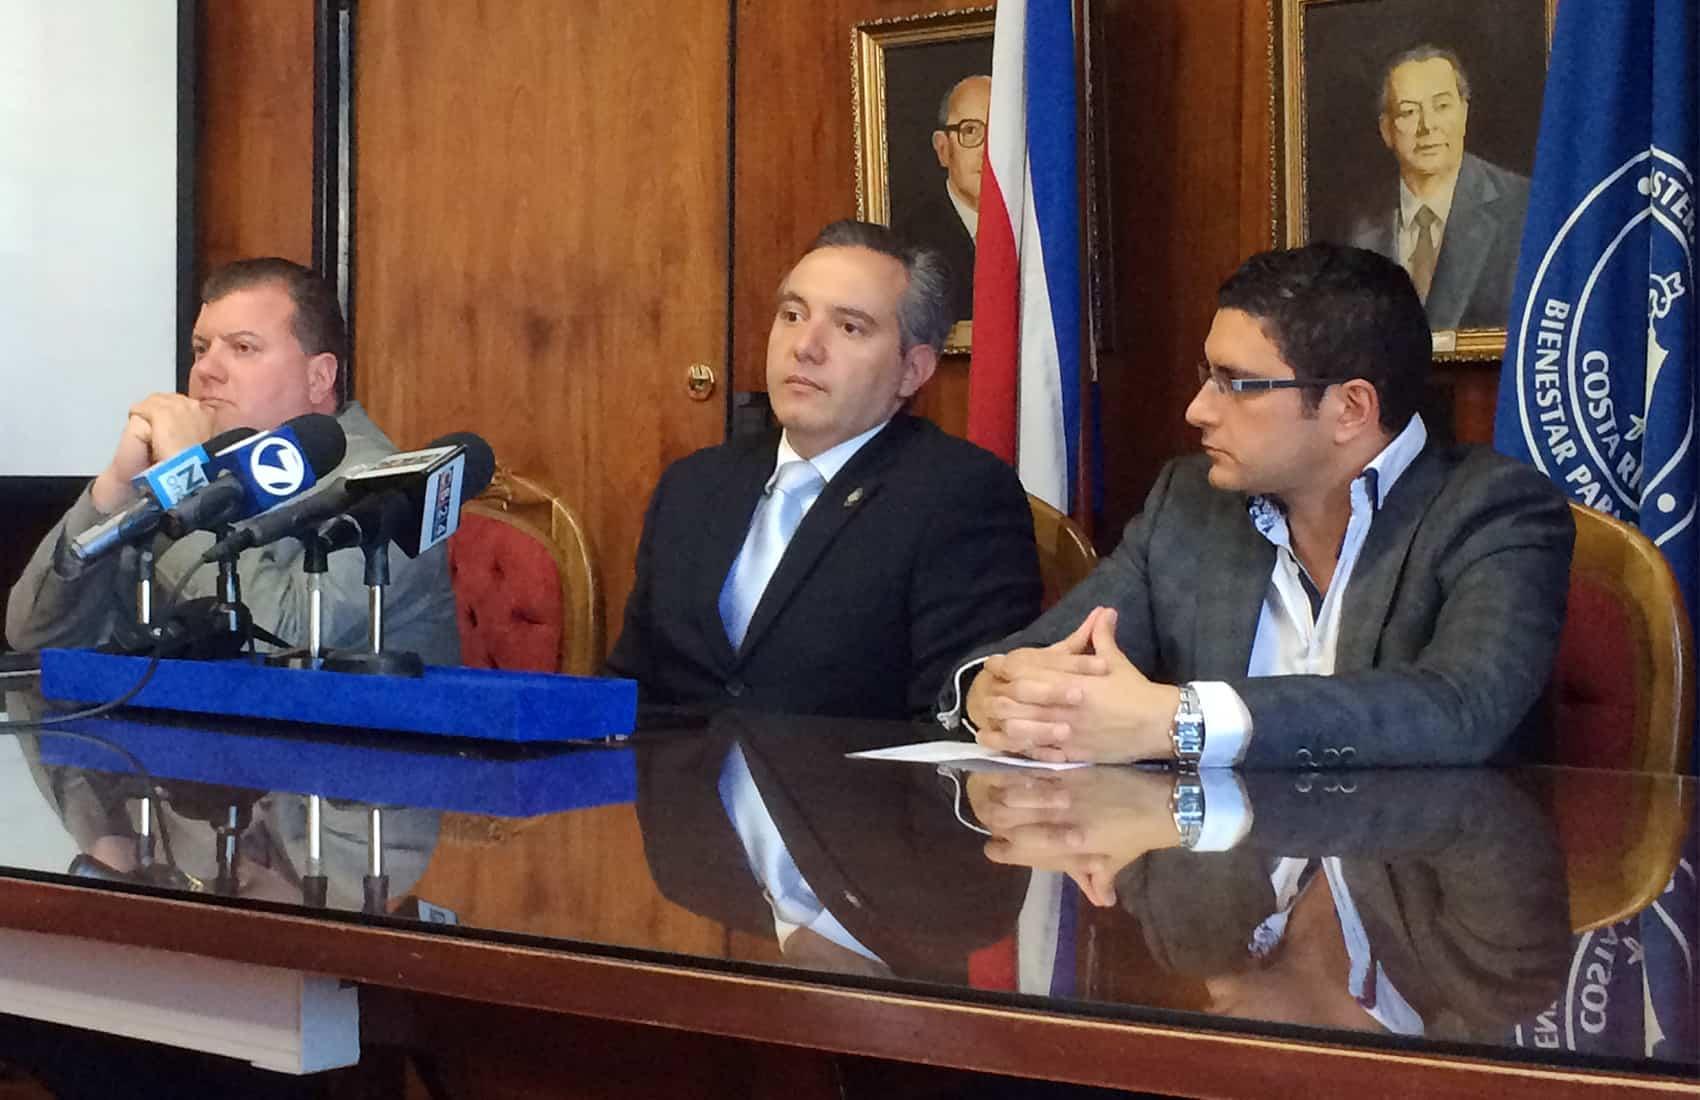 Zika virus announcement: Health Minister Fernando Llorca, Feb. 22 2016